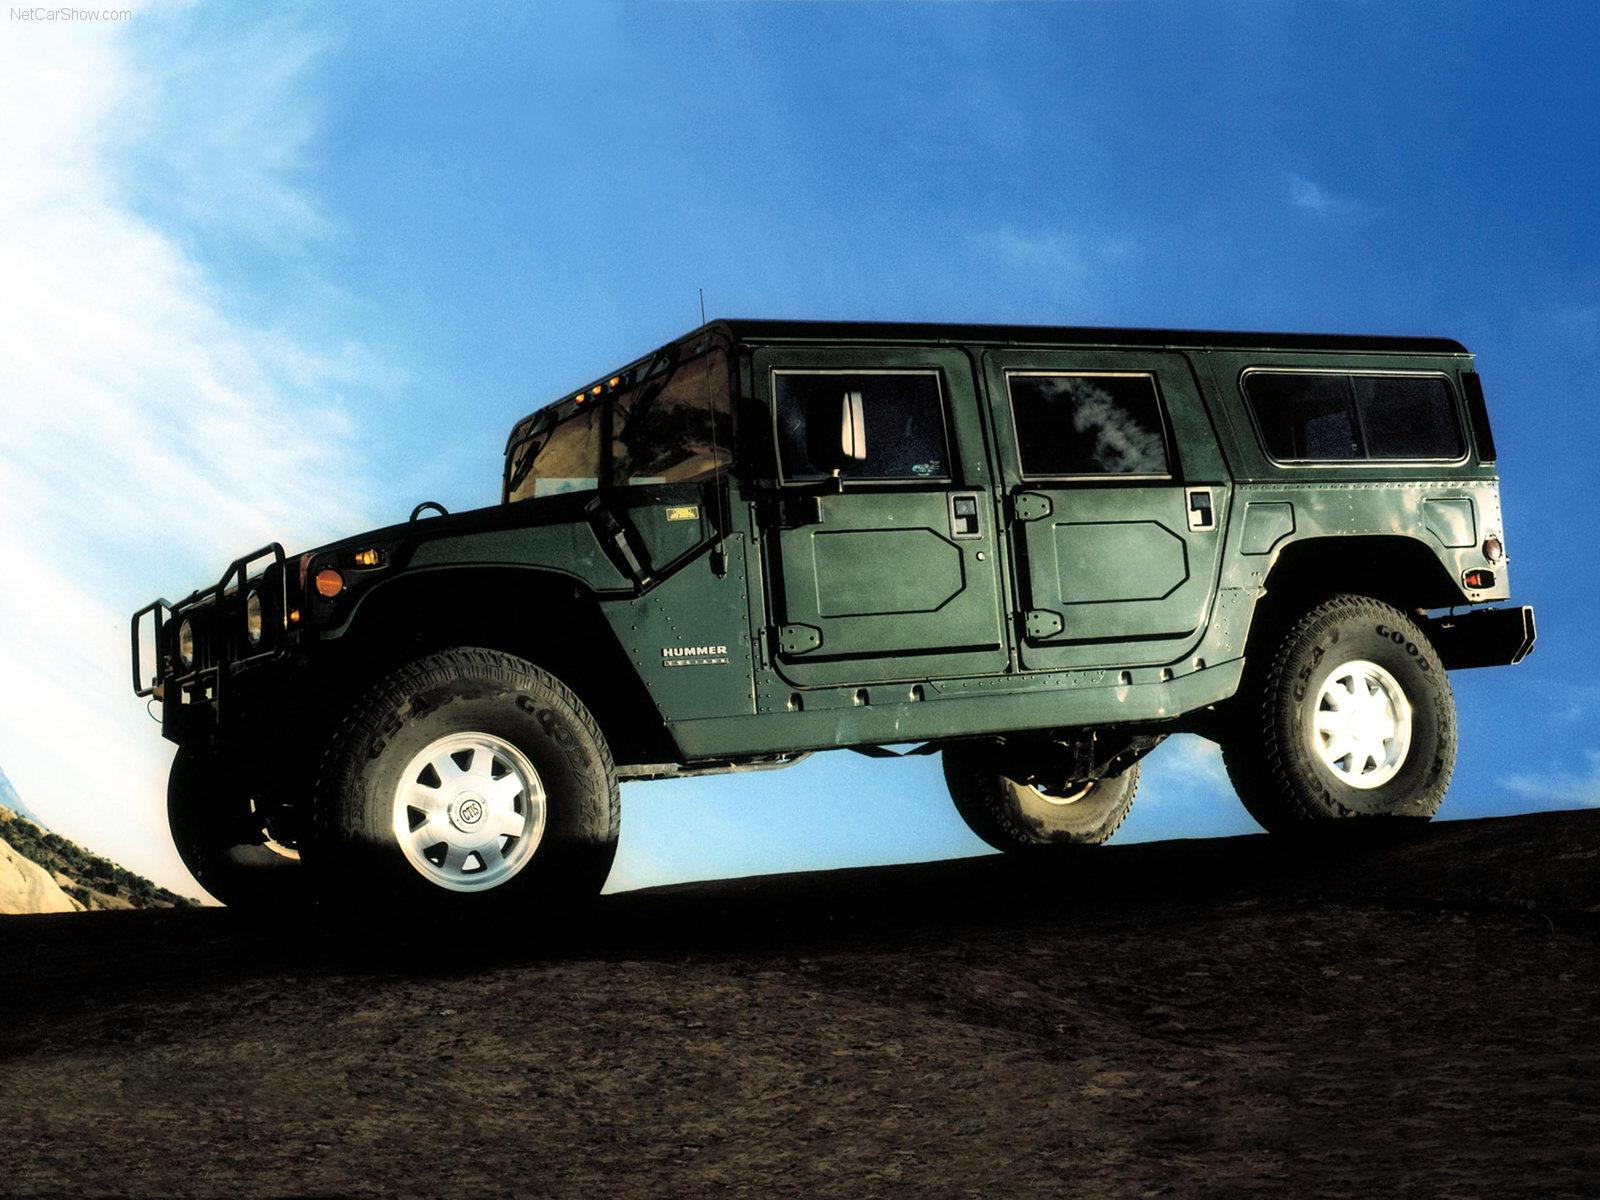 3DTuning of Hummer H1 SUV 1996 3DTuning unique on line car